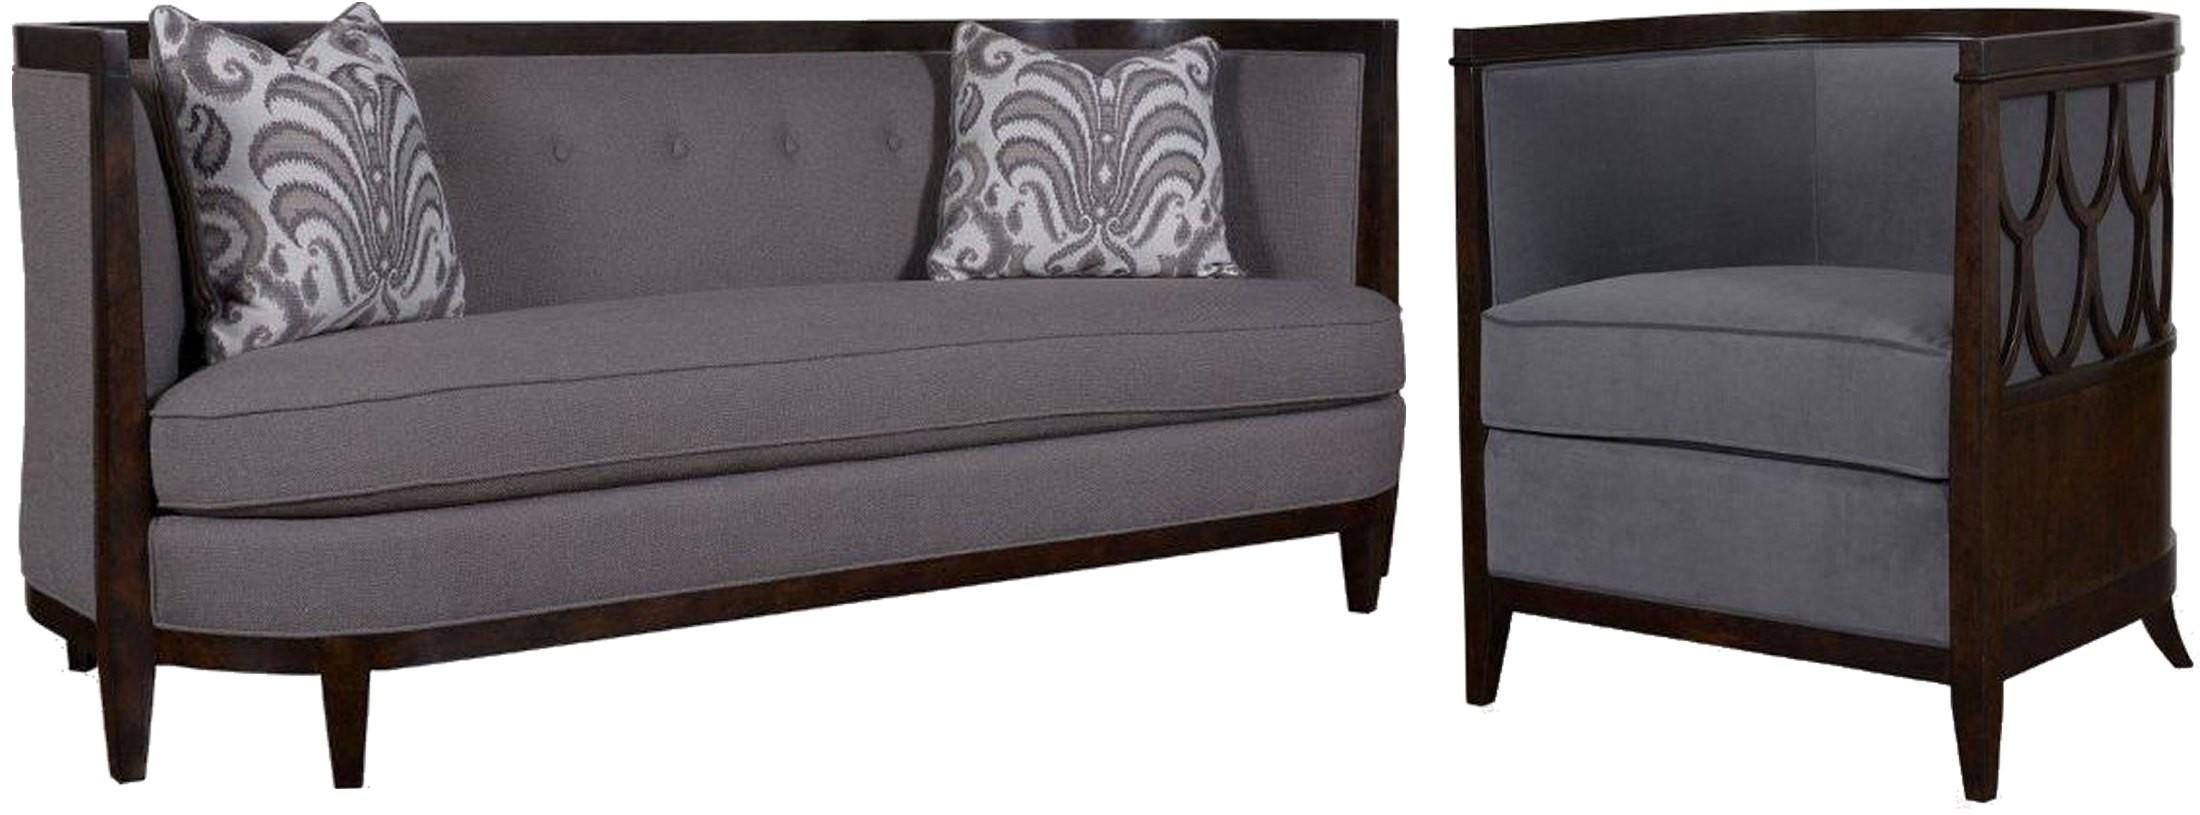 Morgan Charcoal Living Room Set from ART 5001AA